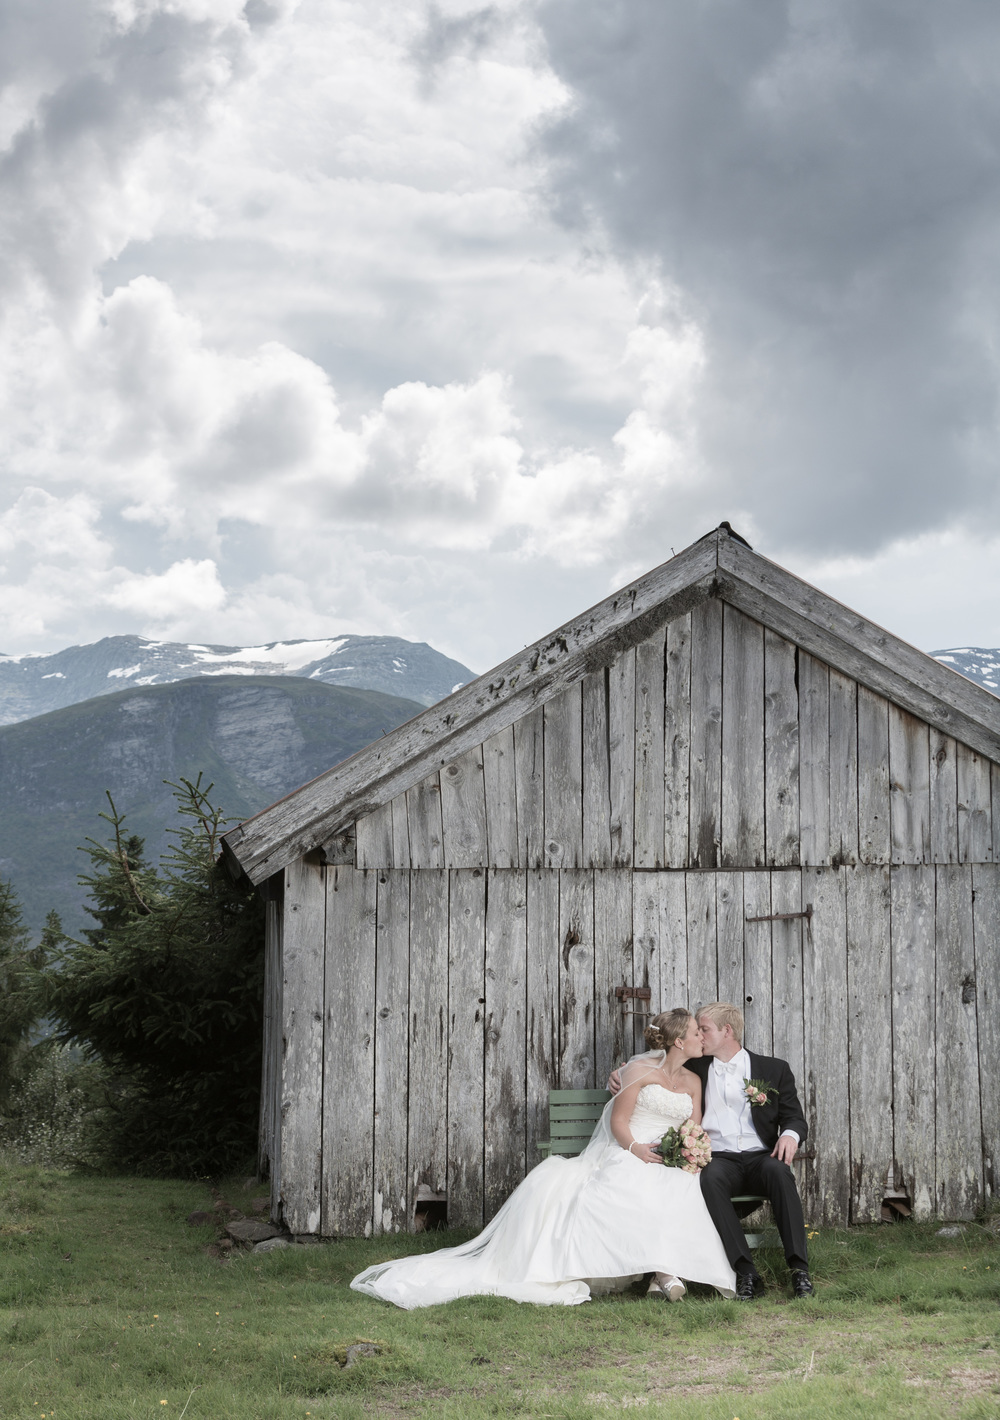 Elise & Andreas, Hornindalssætra